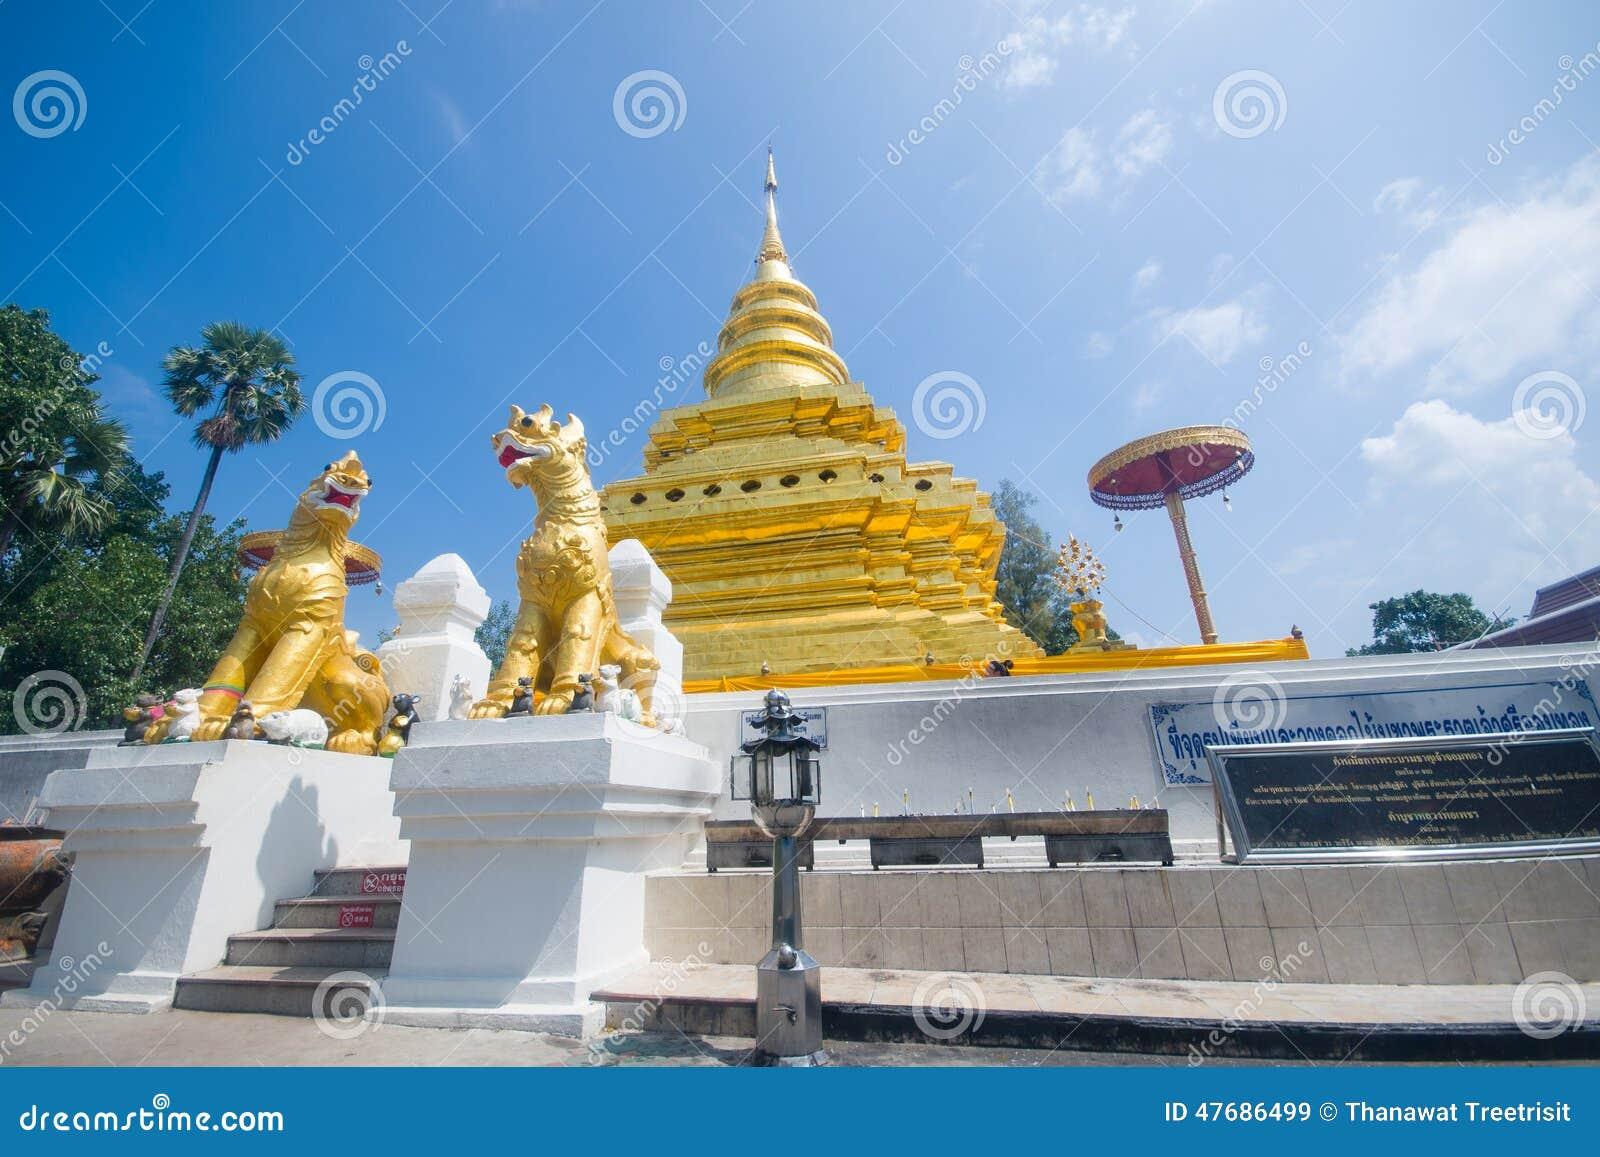 Golden Pagoda, Wat Phra That Sri Jom Thong (the Royal Temple)